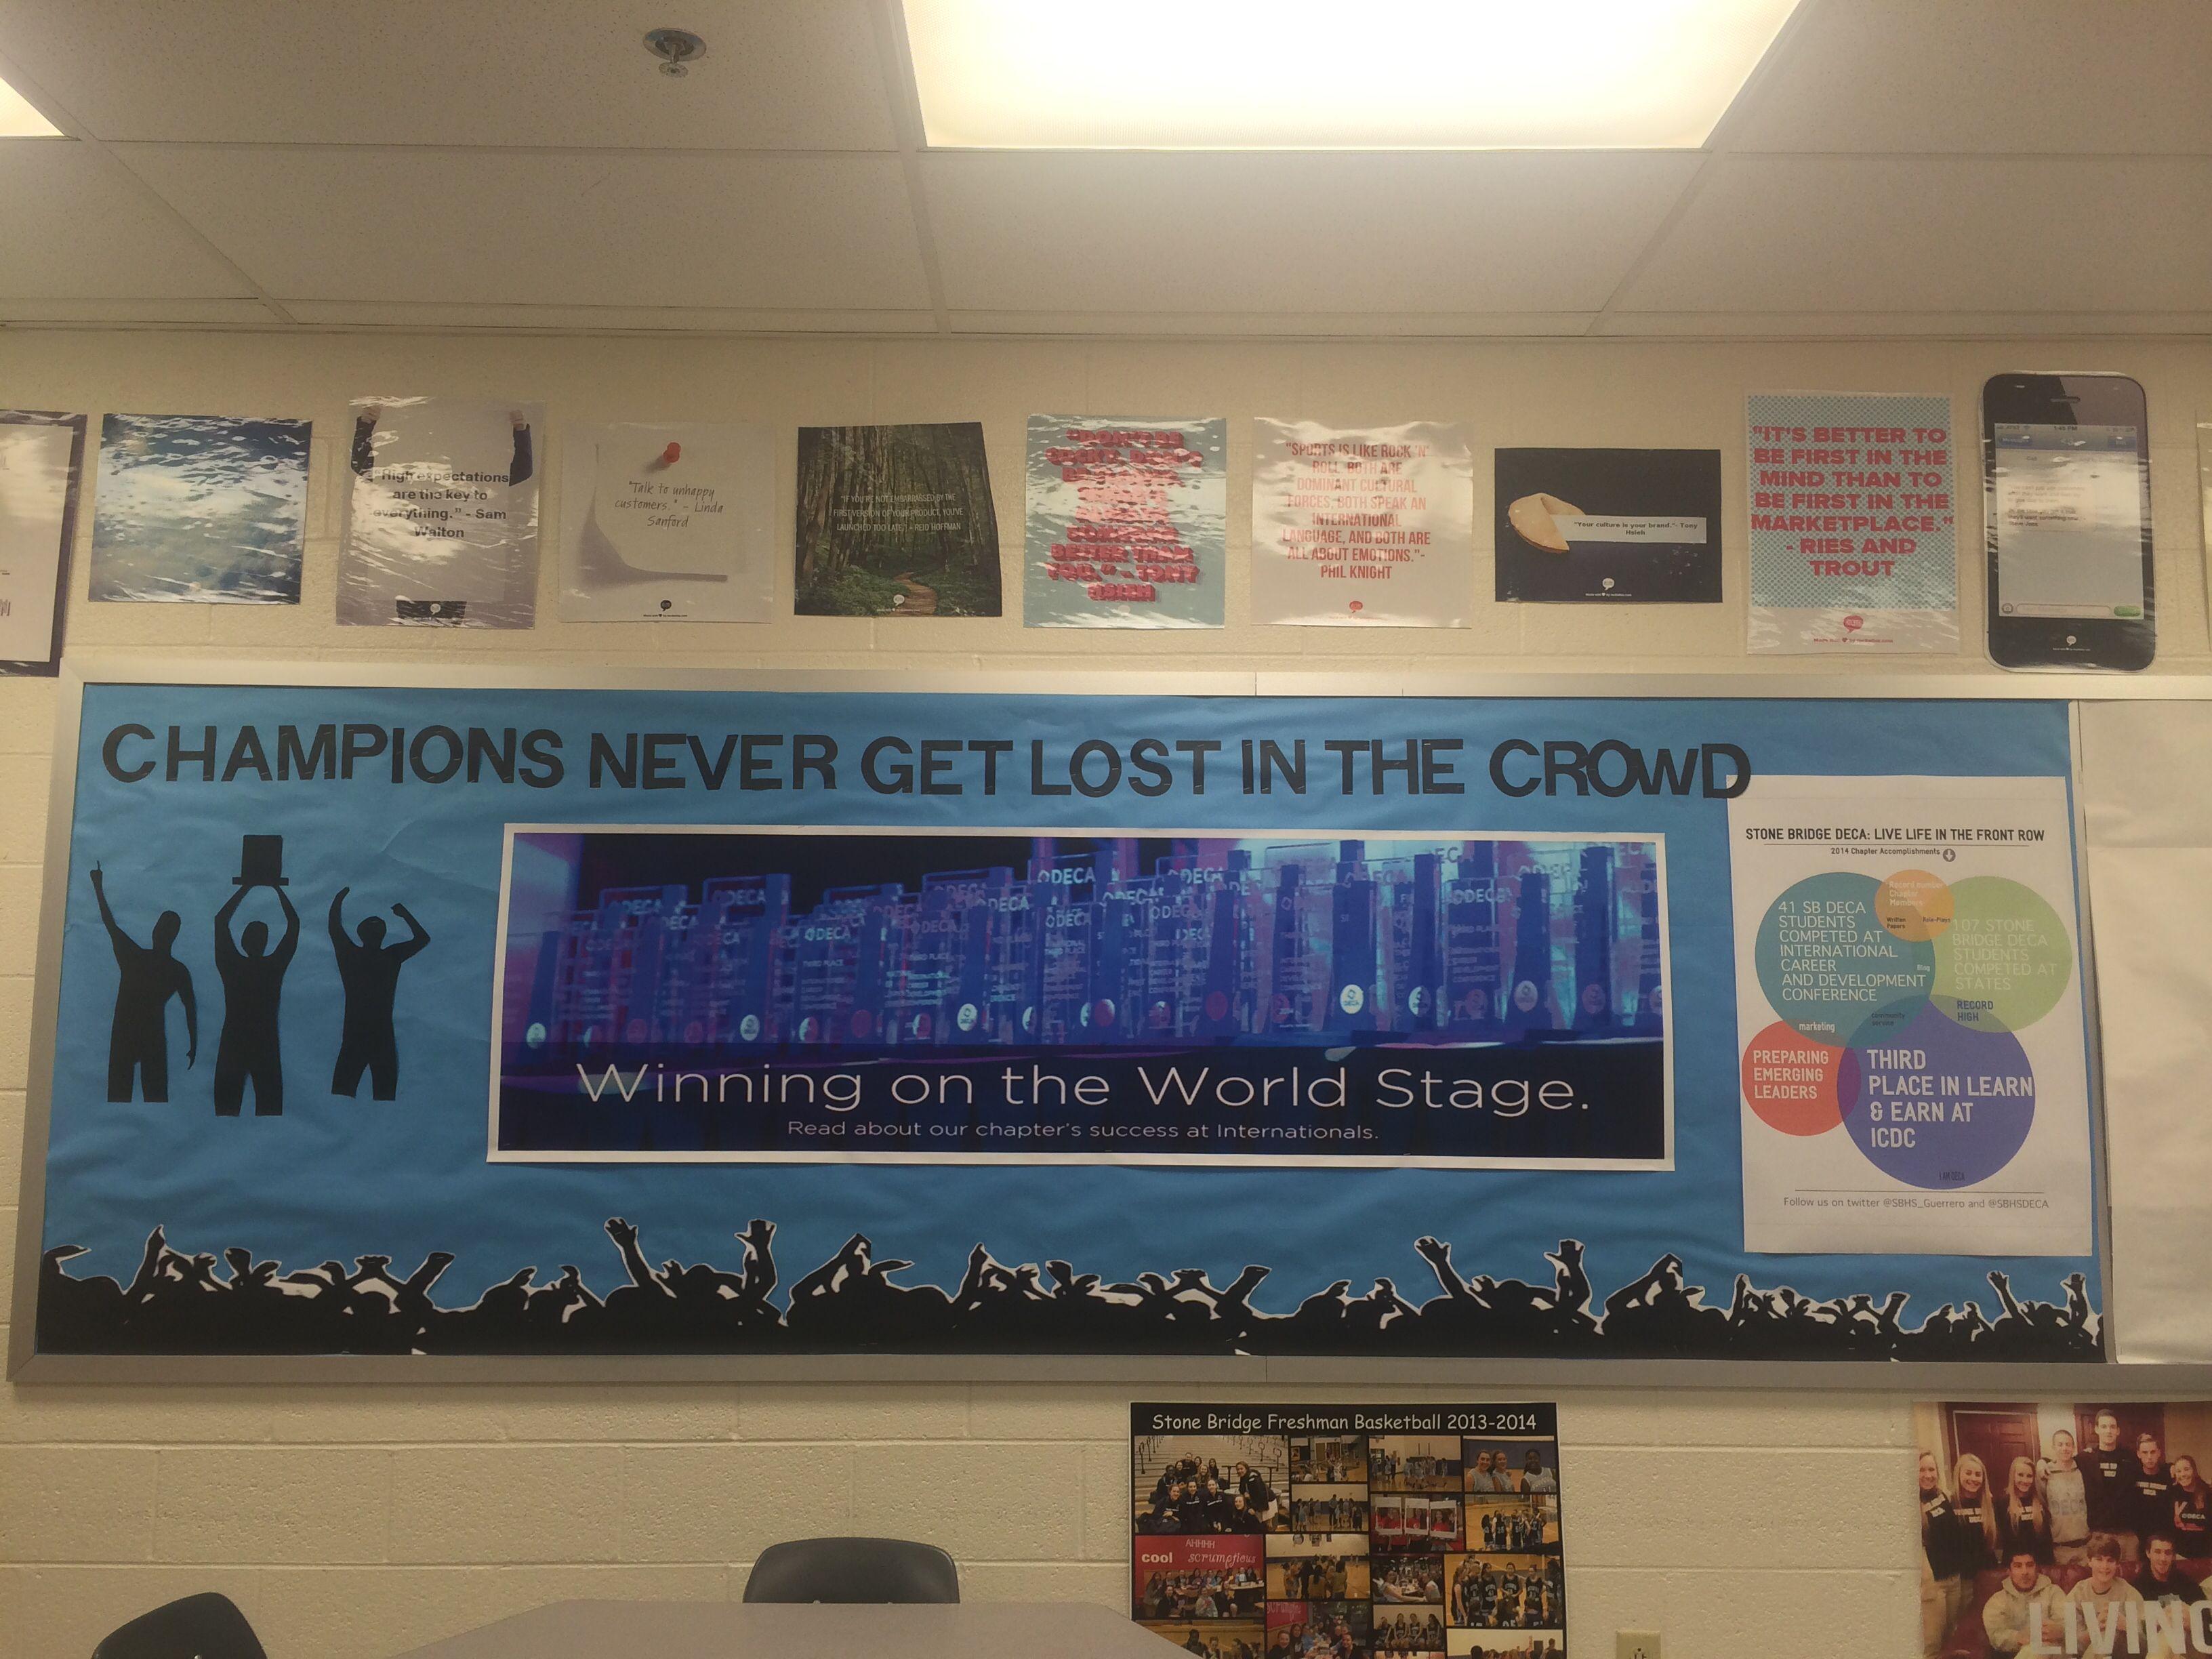 DECA Bulletin Board- Stone Bridge High School Ms Guerrero | DECA